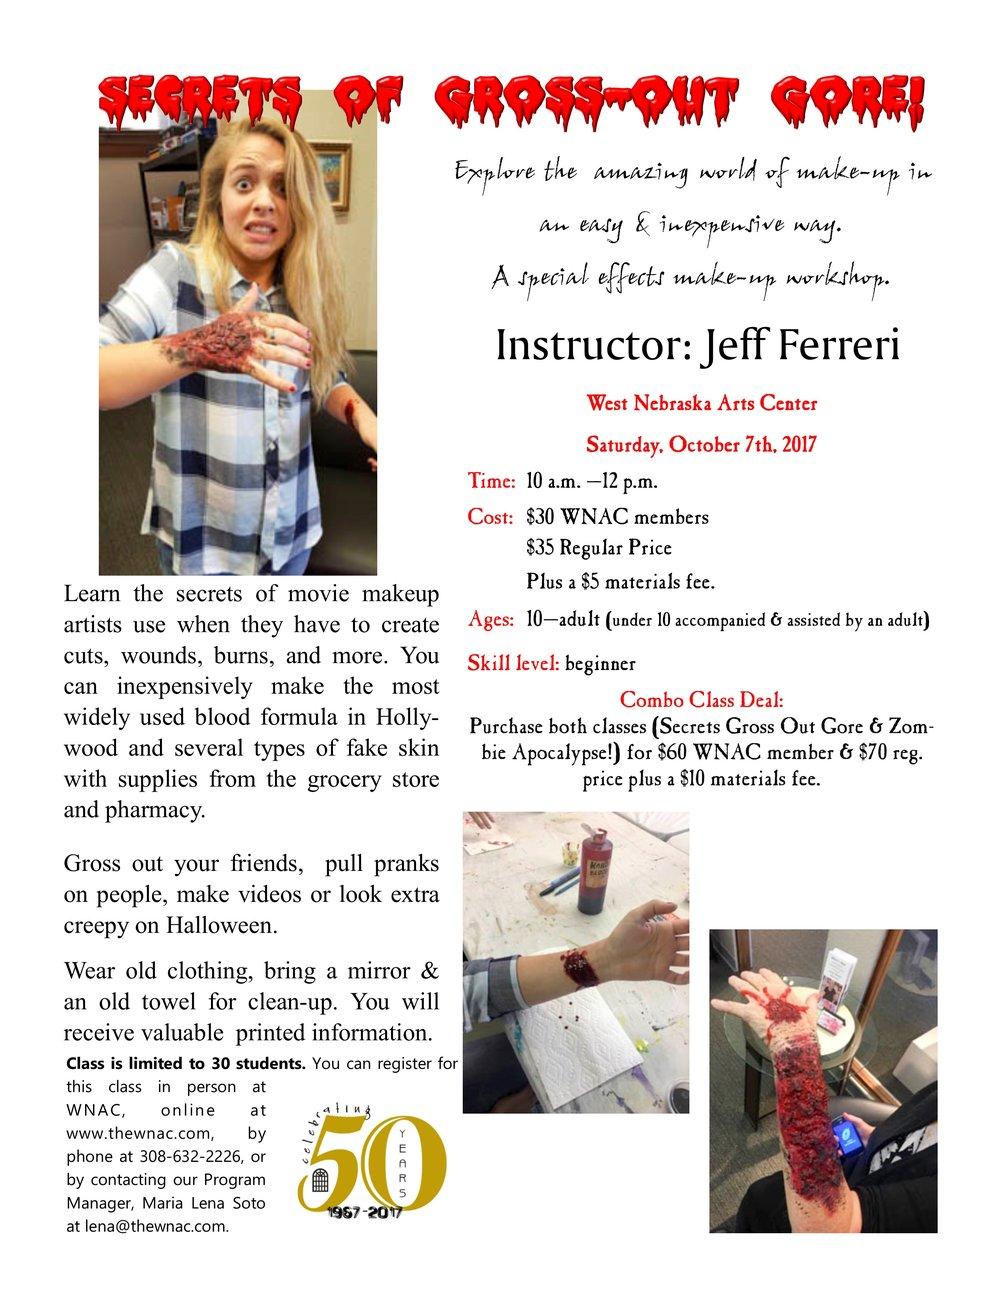 2017 Ferreri- Secrets of Gross-Out Gore flyer.jpg